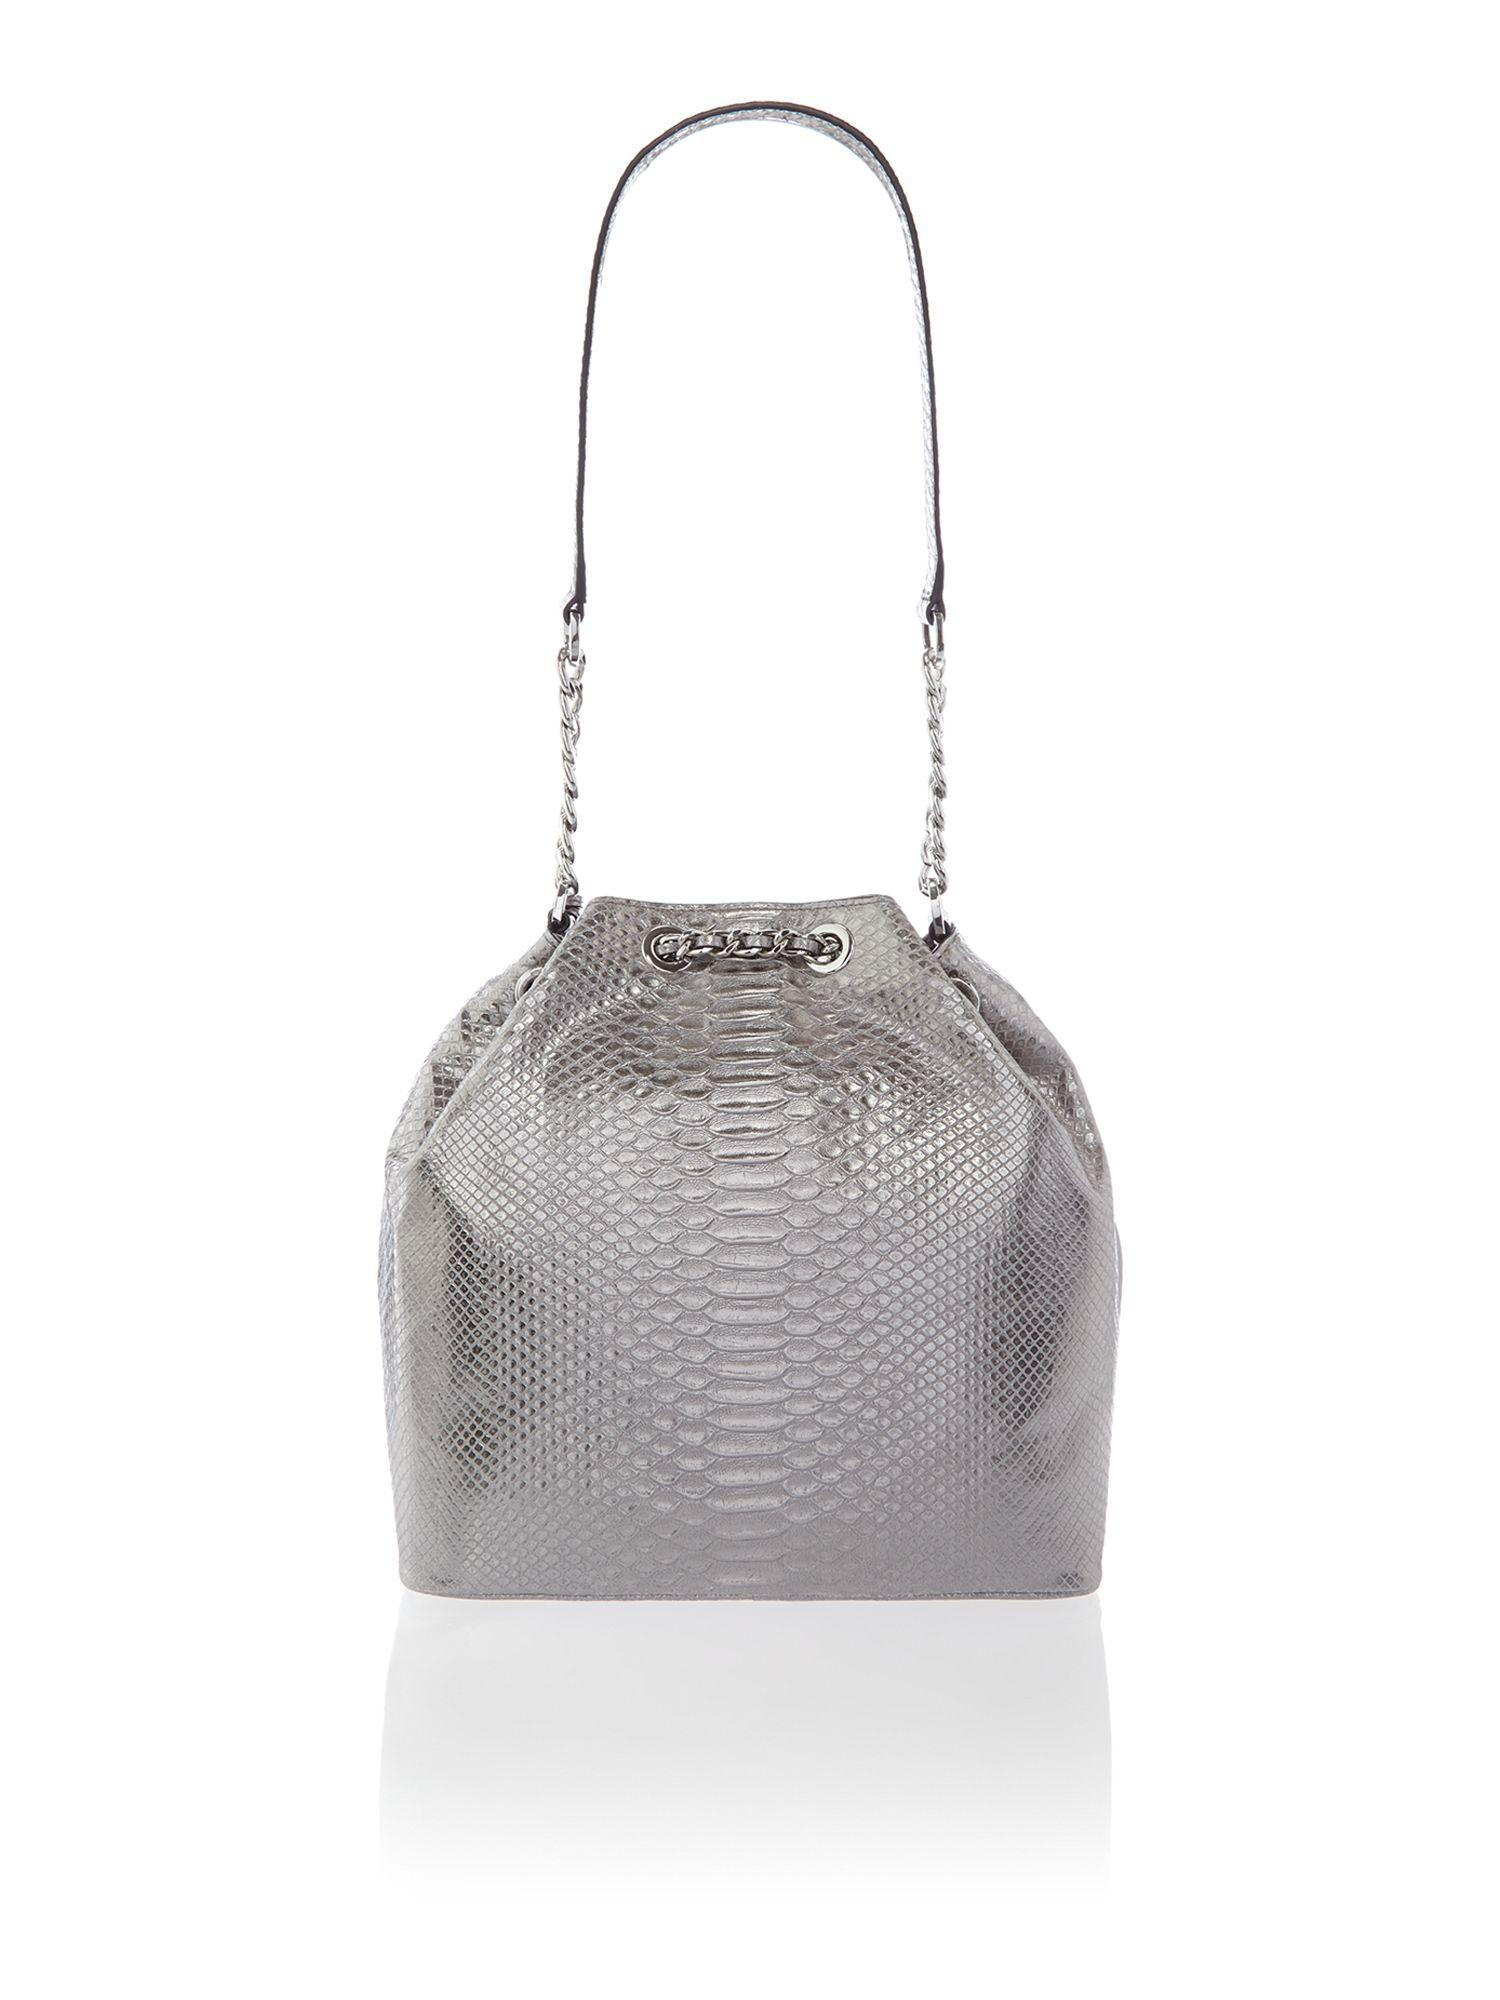 michael kors frankie silver snake duffle bag in silver lyst. Black Bedroom Furniture Sets. Home Design Ideas